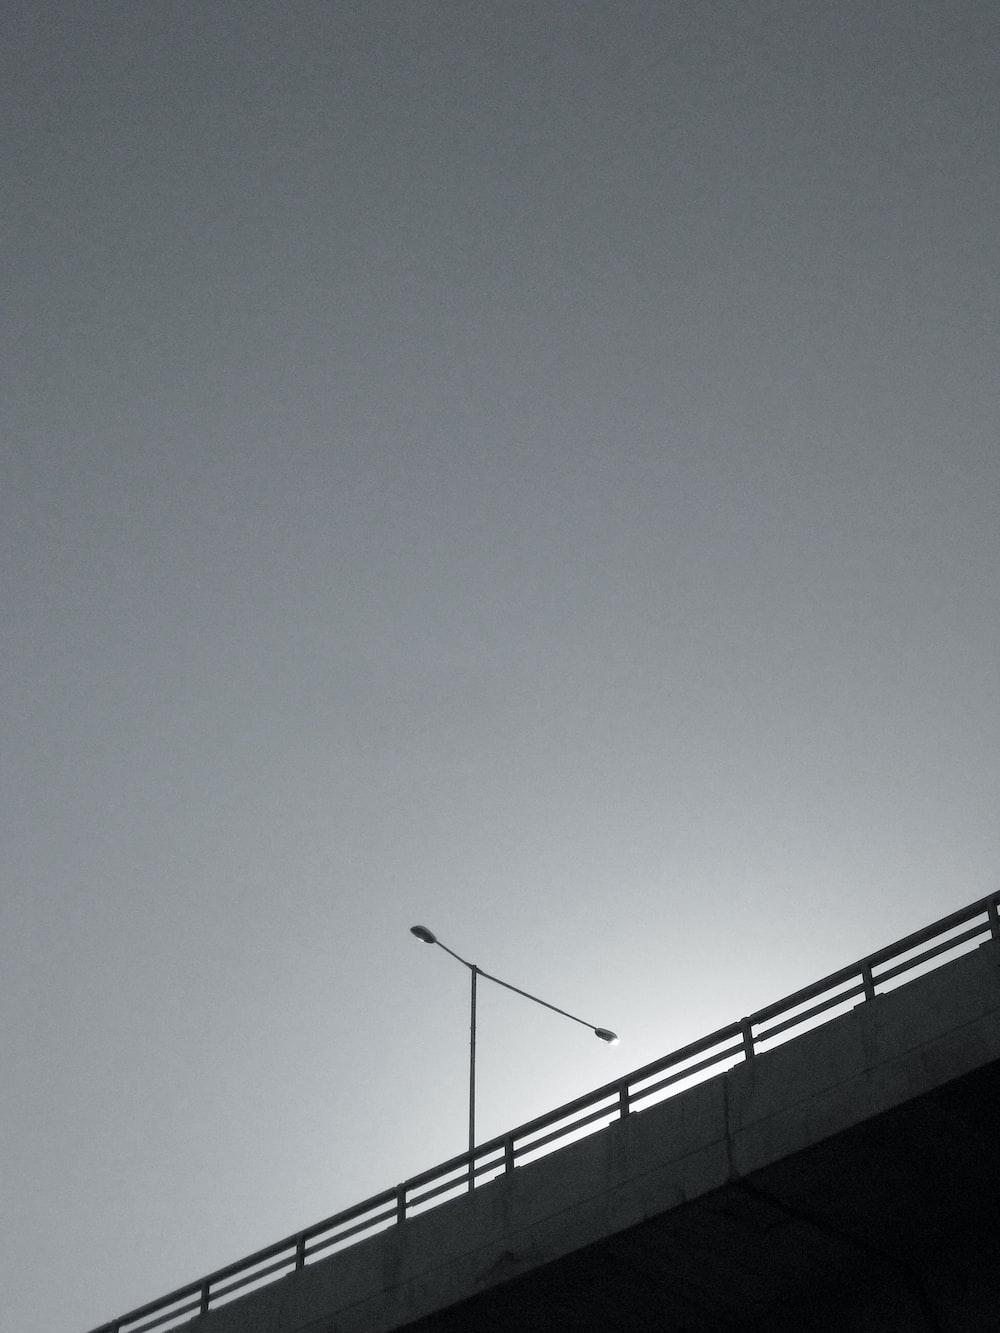 grayscale photo of bridge with postl ight